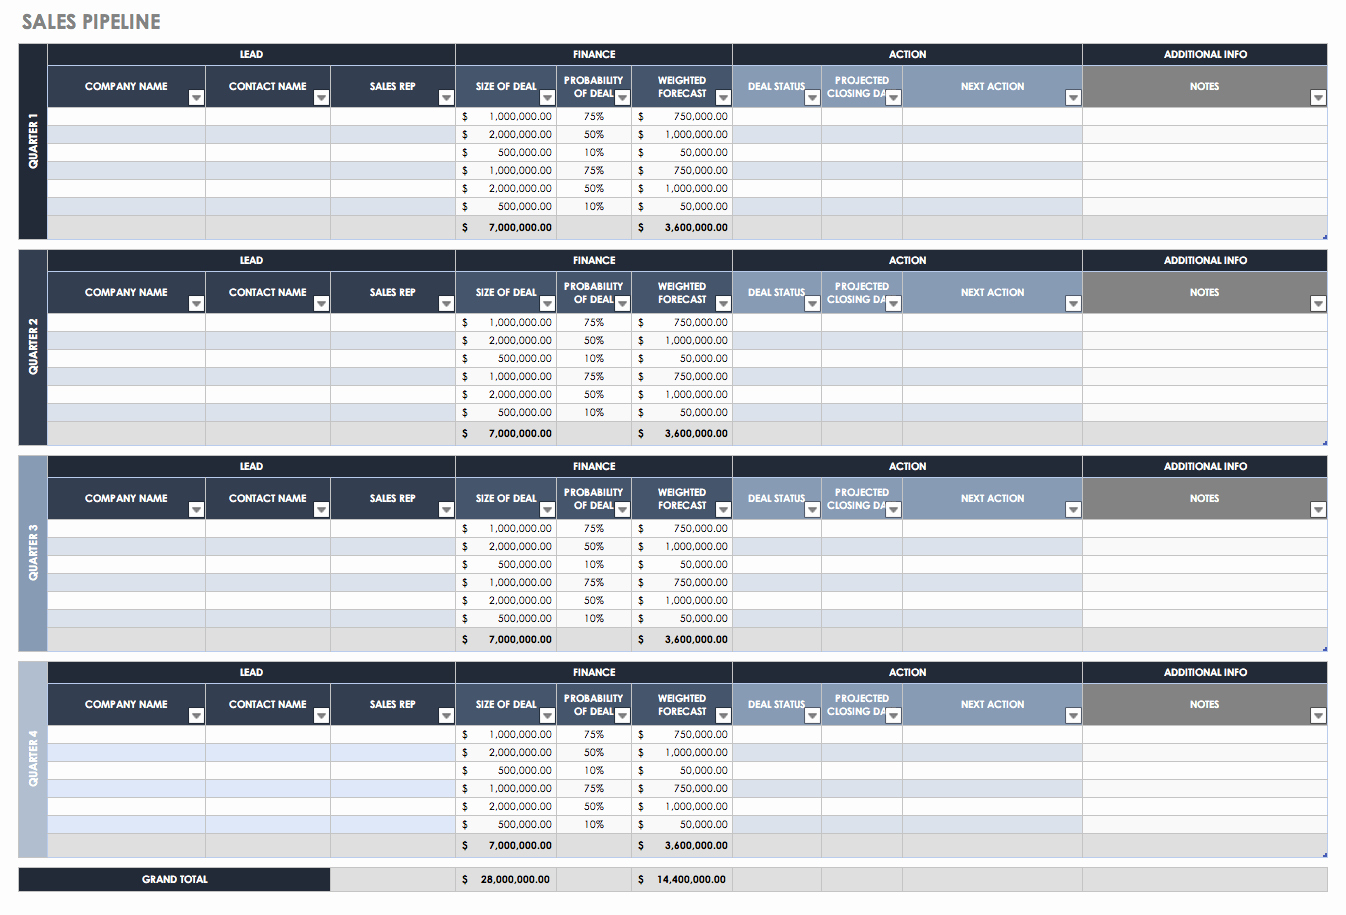 Sales Pipeline Template Excel Elegant Free Sales Pipeline Templates